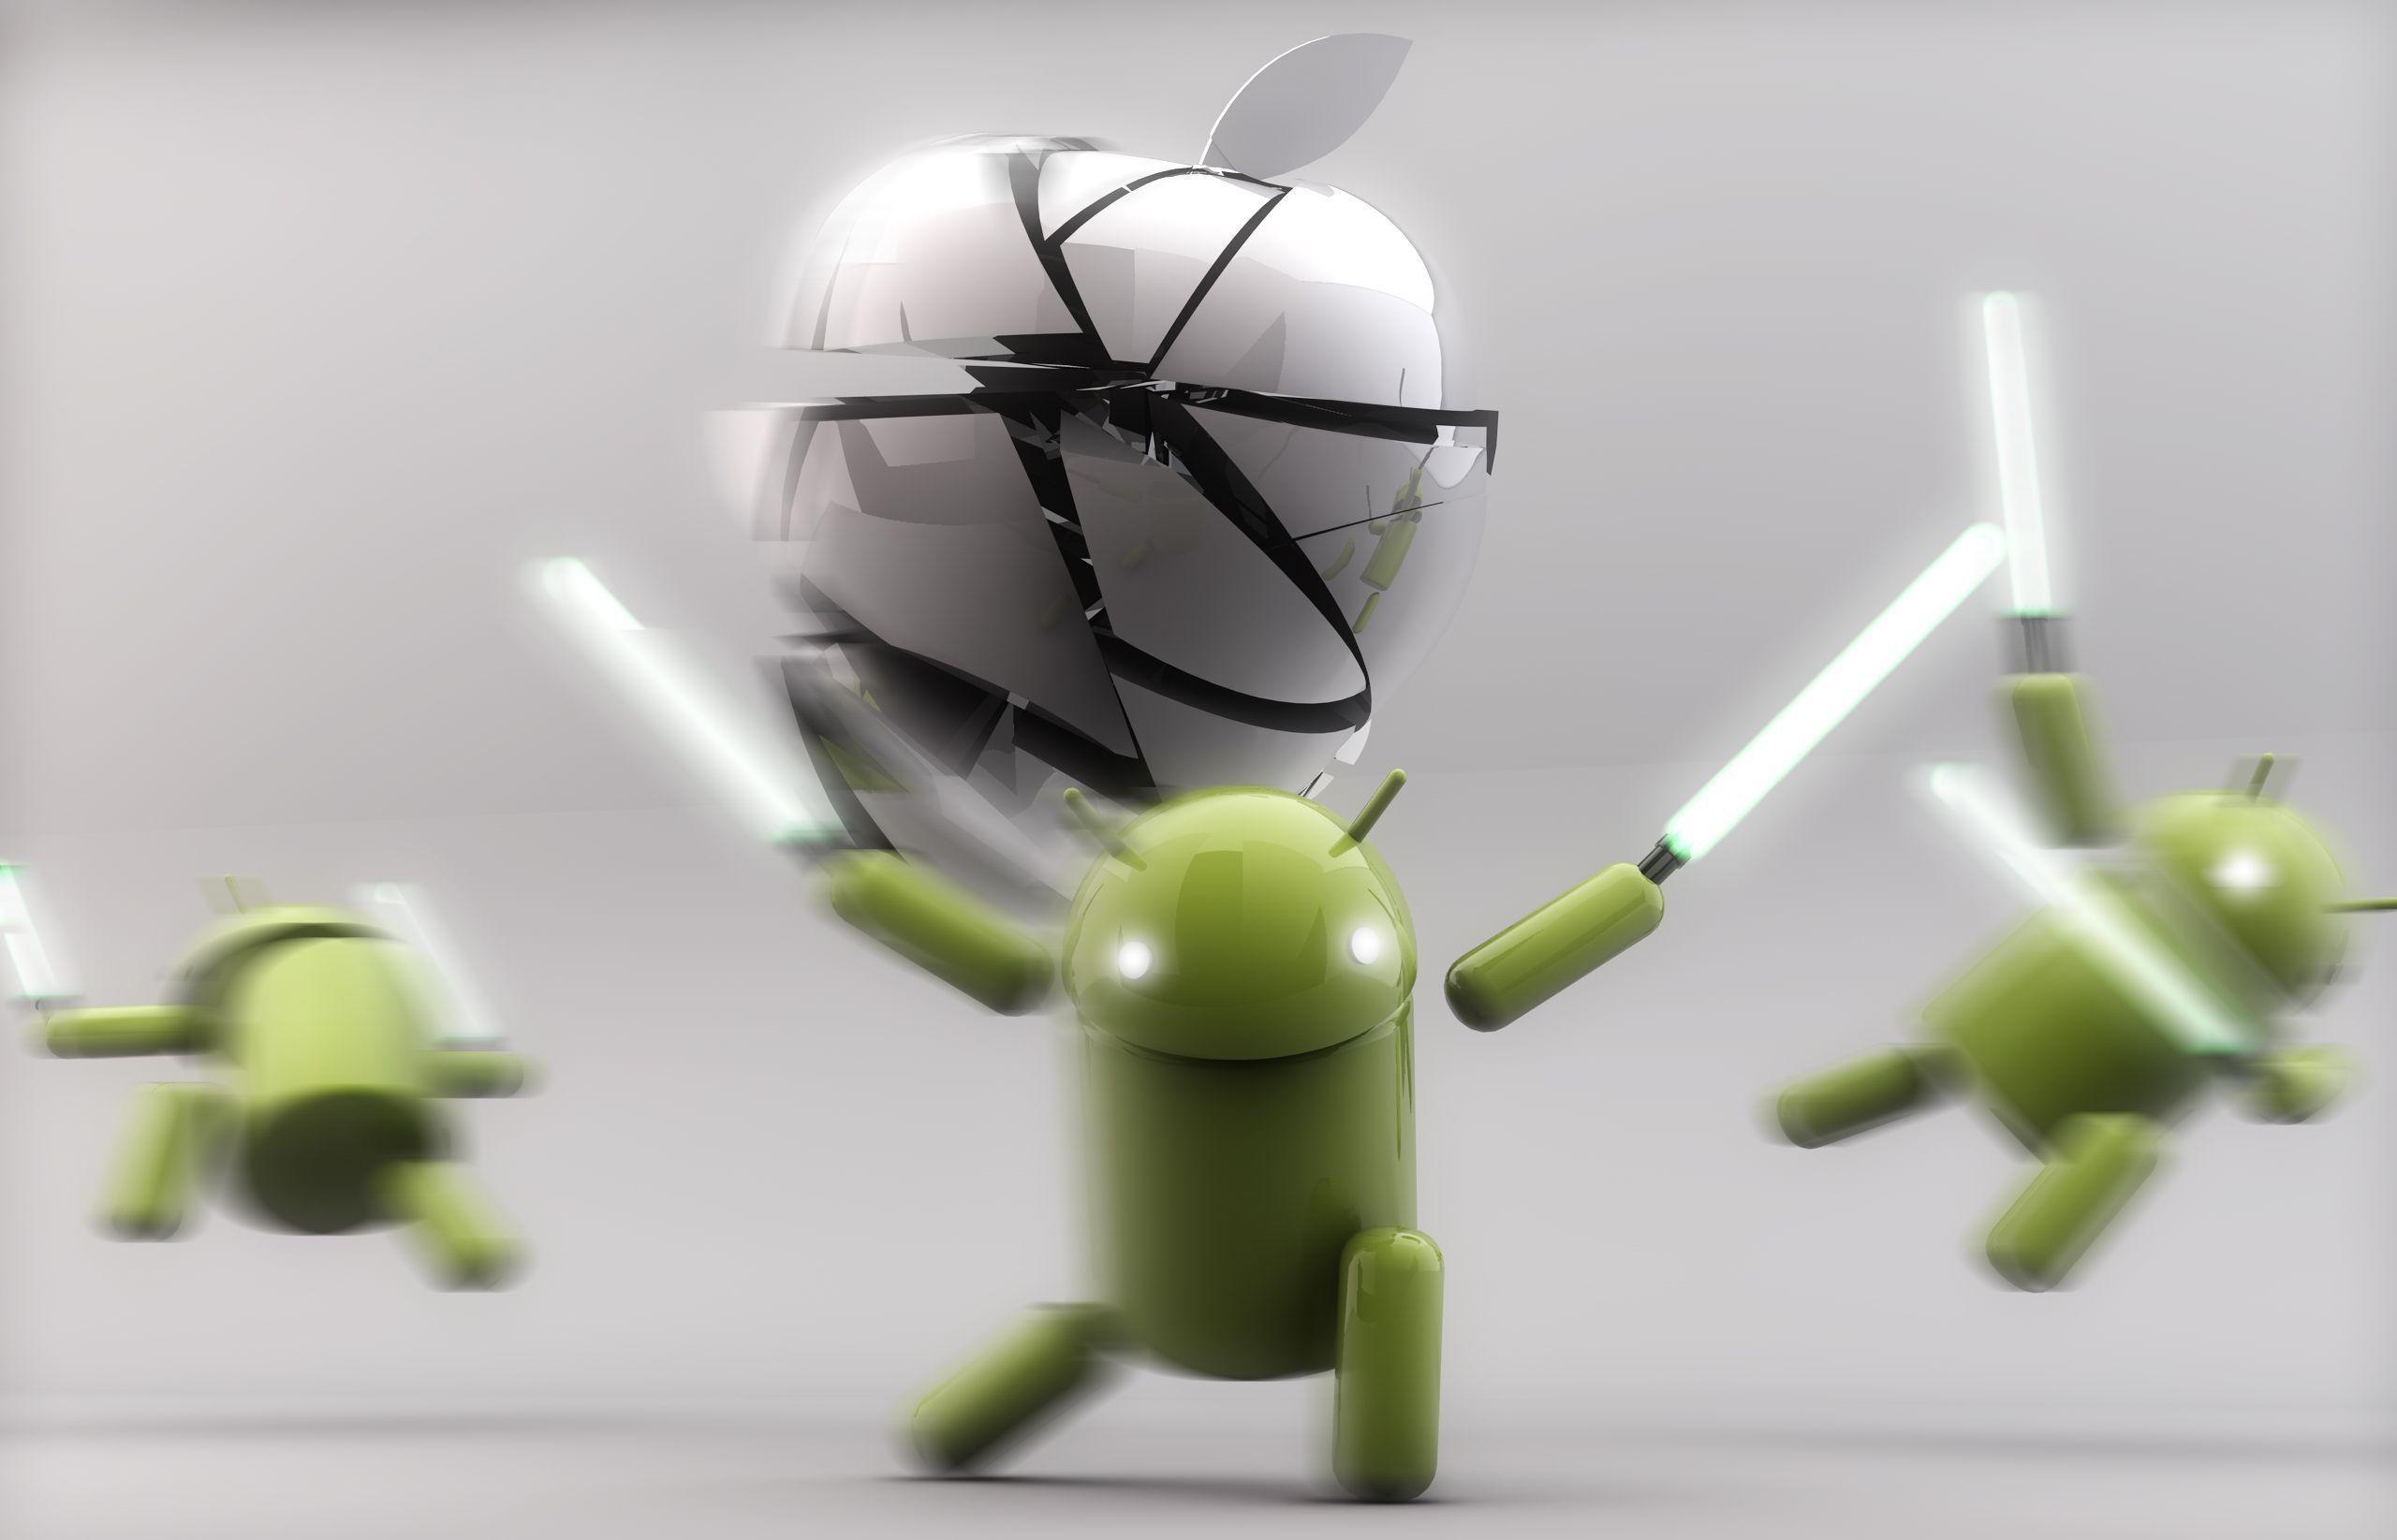 2560x1645 apple vs android wallpaper 2950 wallpaper res 2560x1645 room